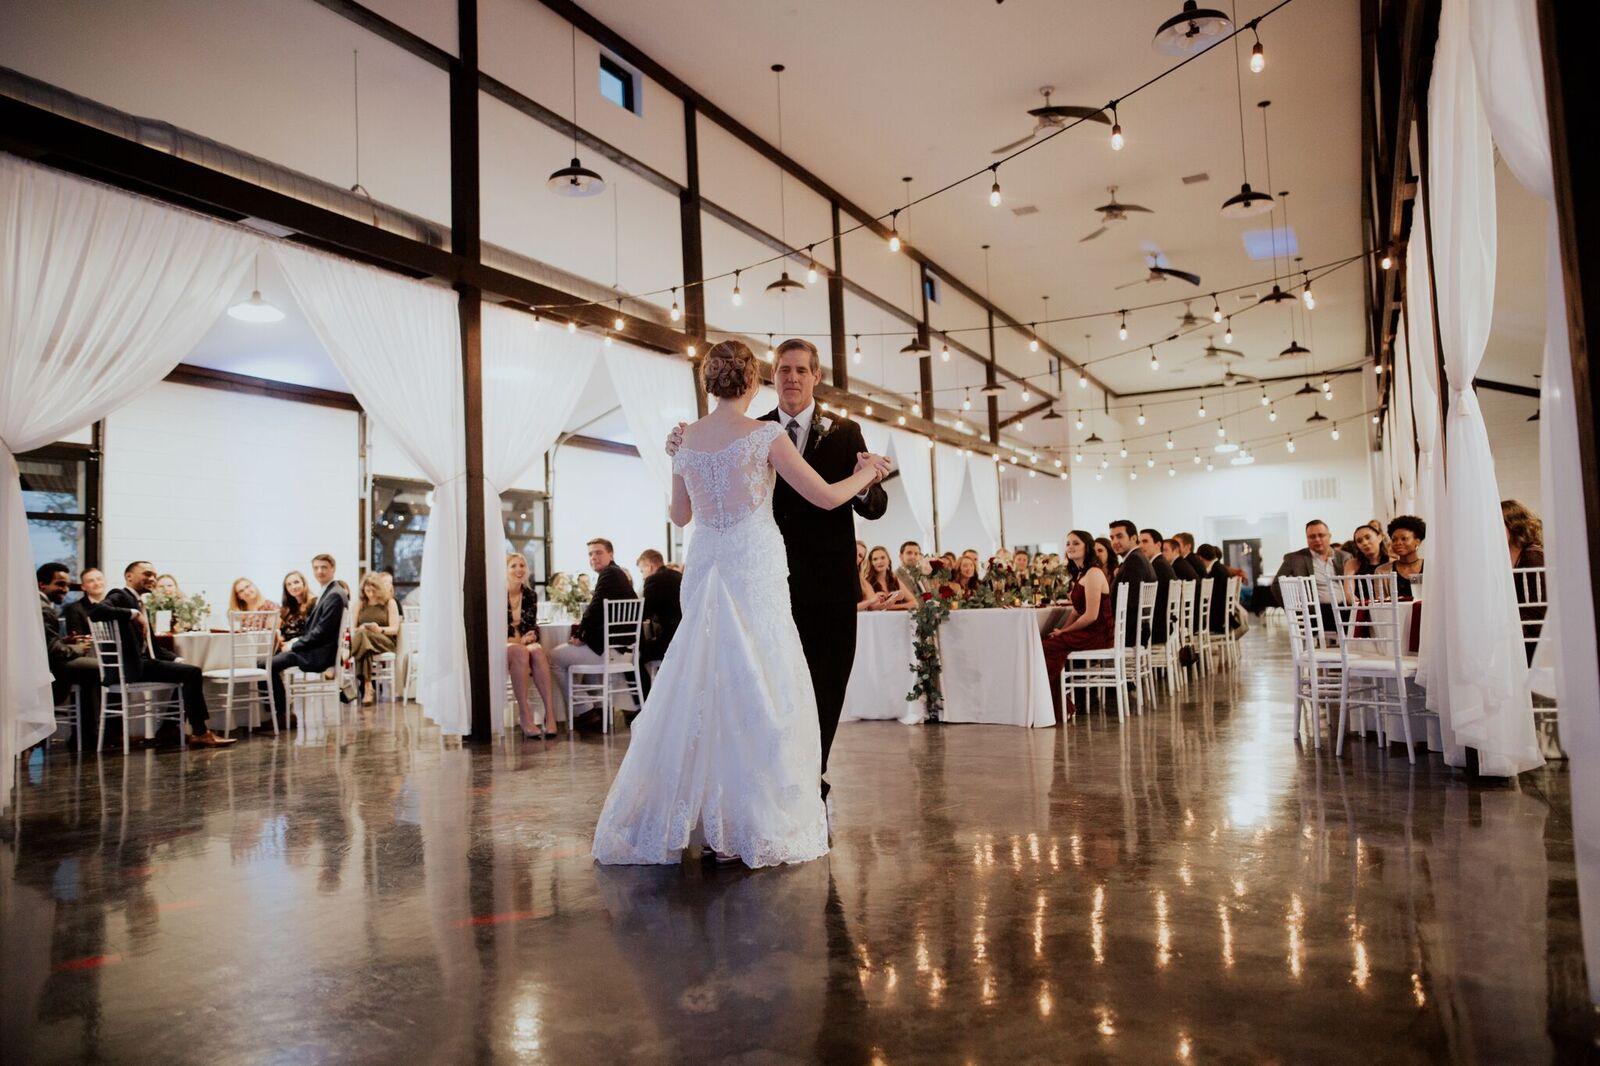 Tulsa Wedding Venue White Barn 20a.jpg